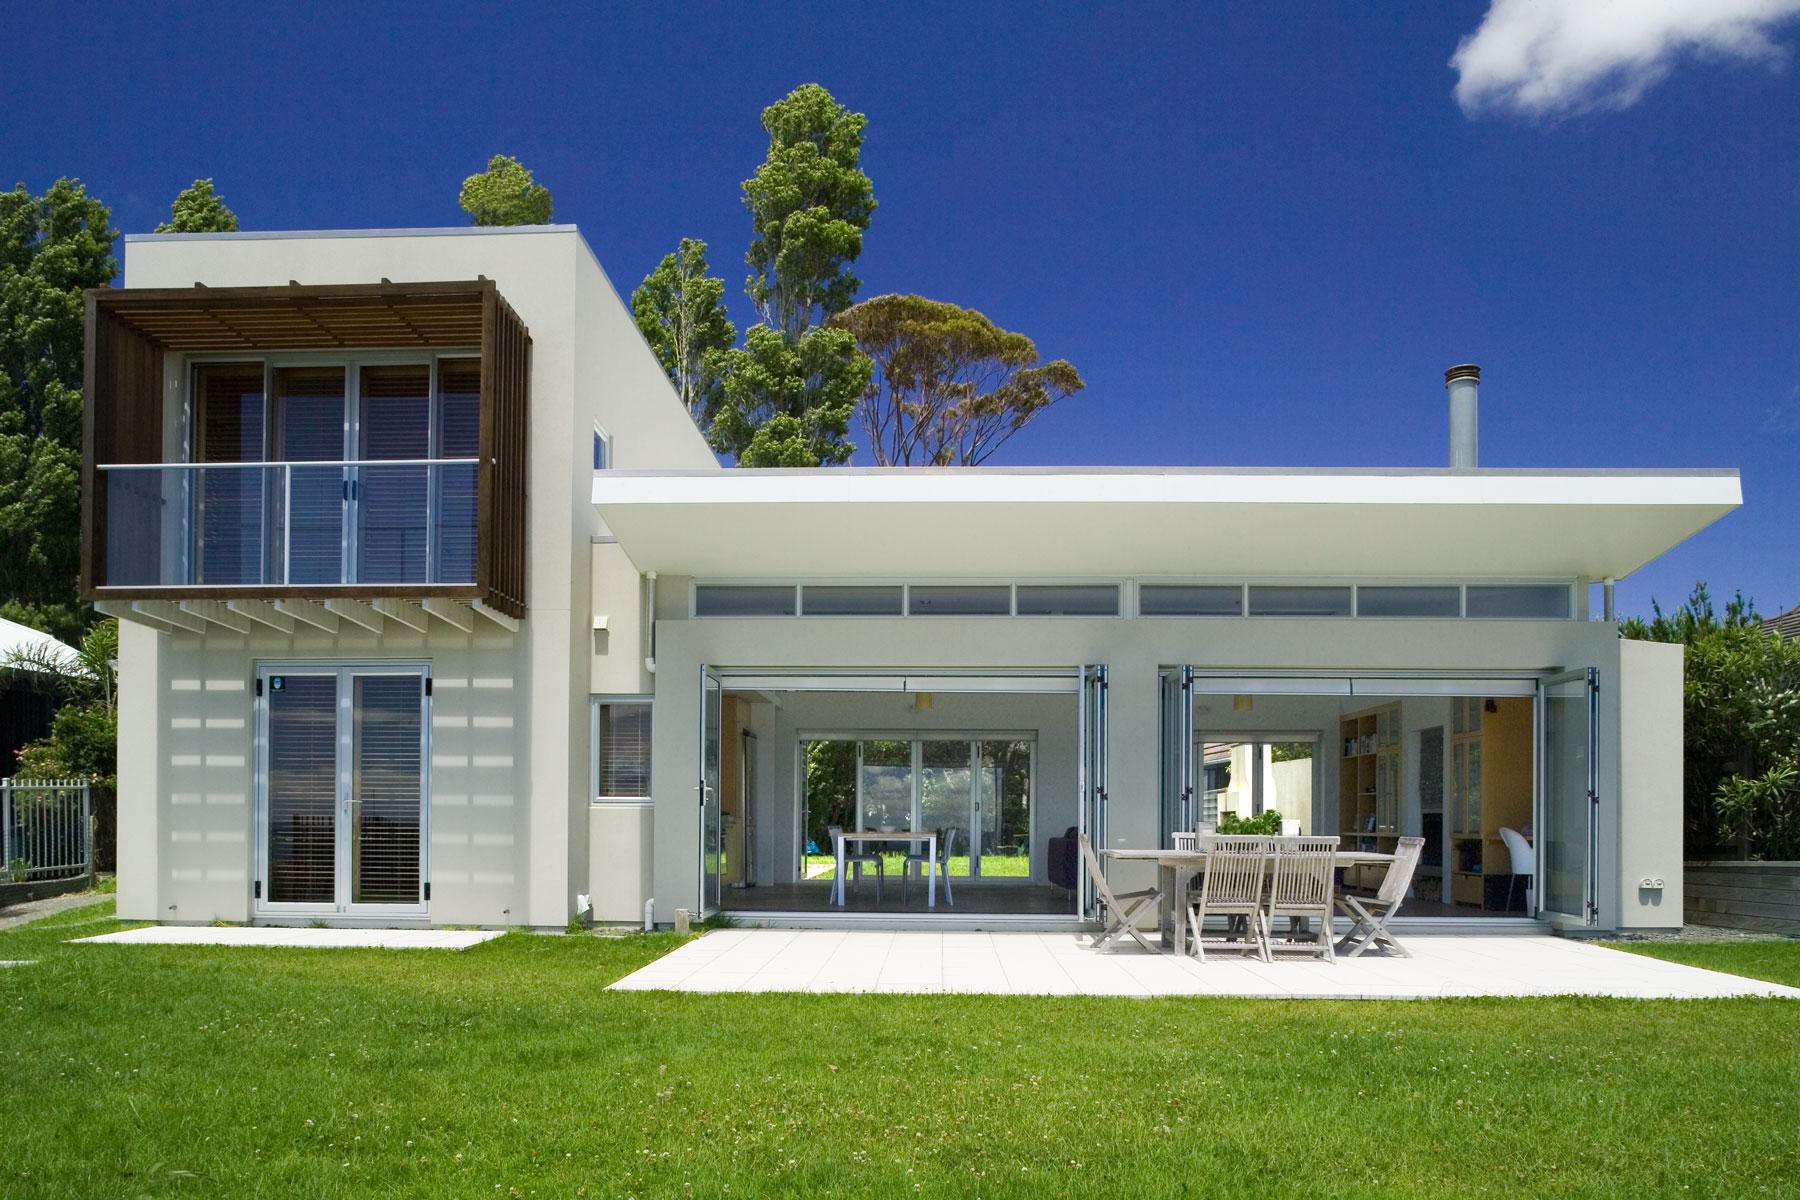 S Leuschke Kahn Architects_StanmoreBay LKA_F2J95813.jpg